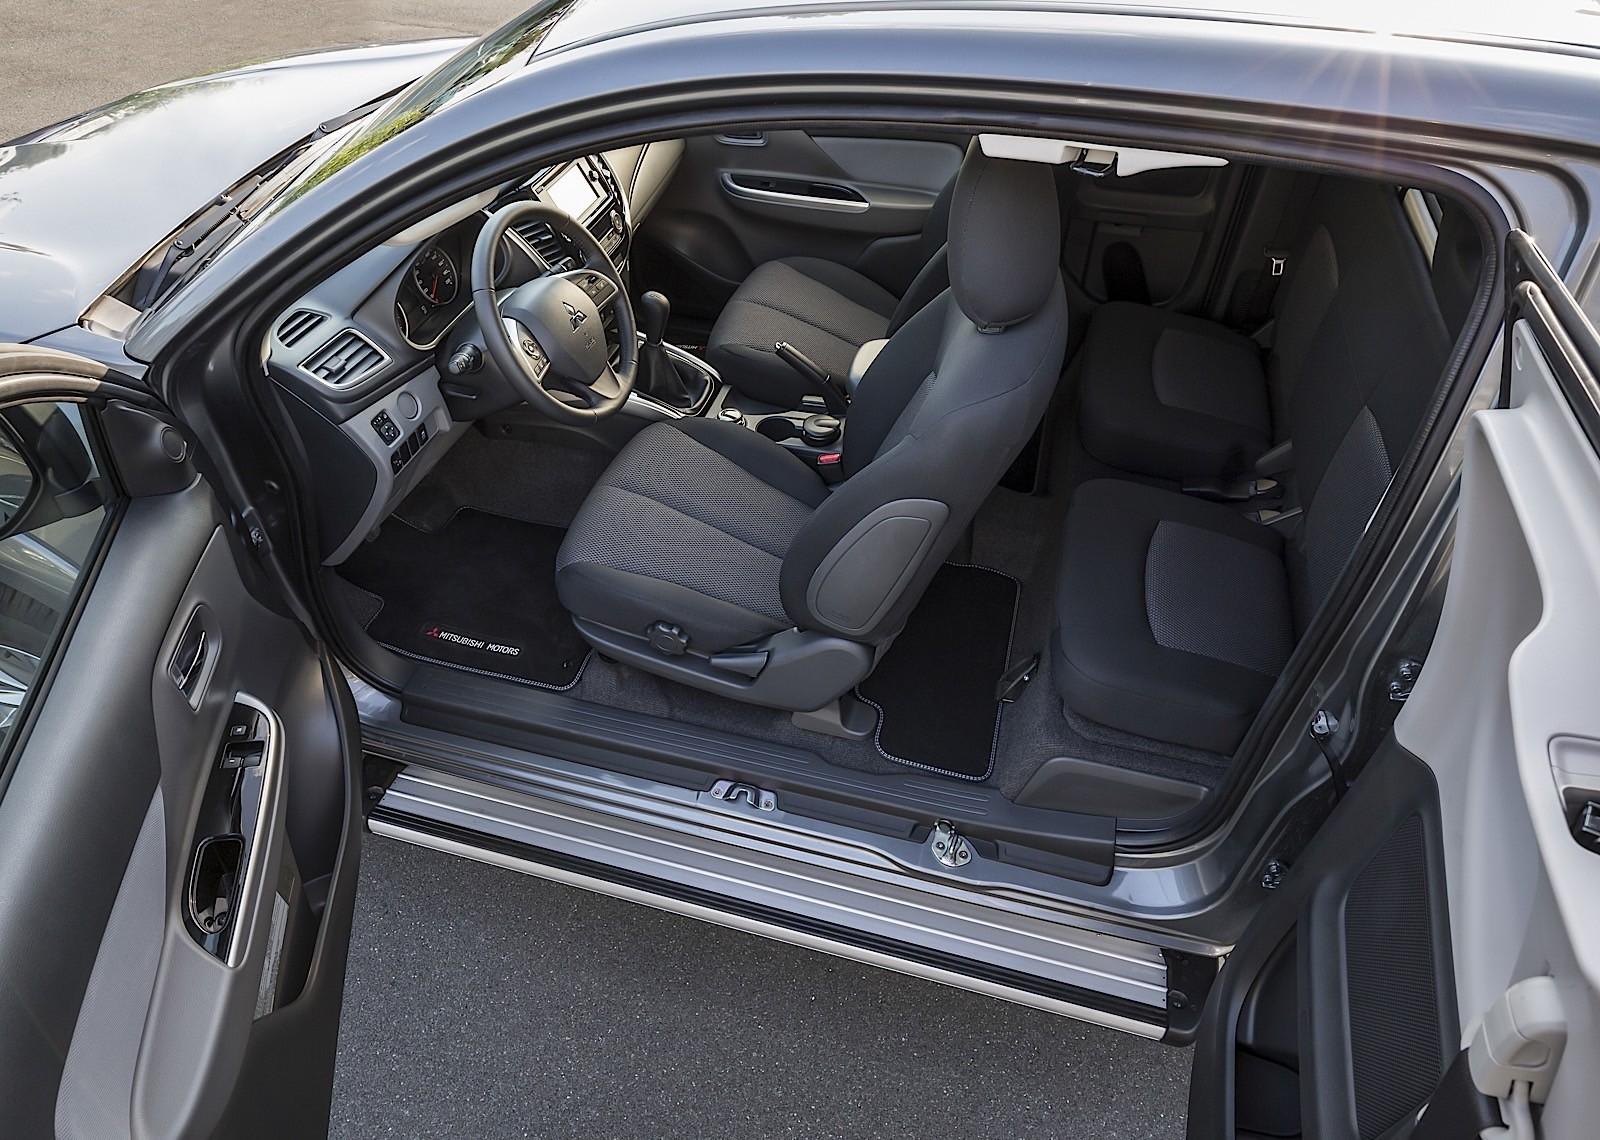 2015 Mitsubishi Eclipse >> MITSUBISHI L200 Club Cab specs & photos - 2015, 2016, 2017, 2018, 2019, 2020 - autoevolution